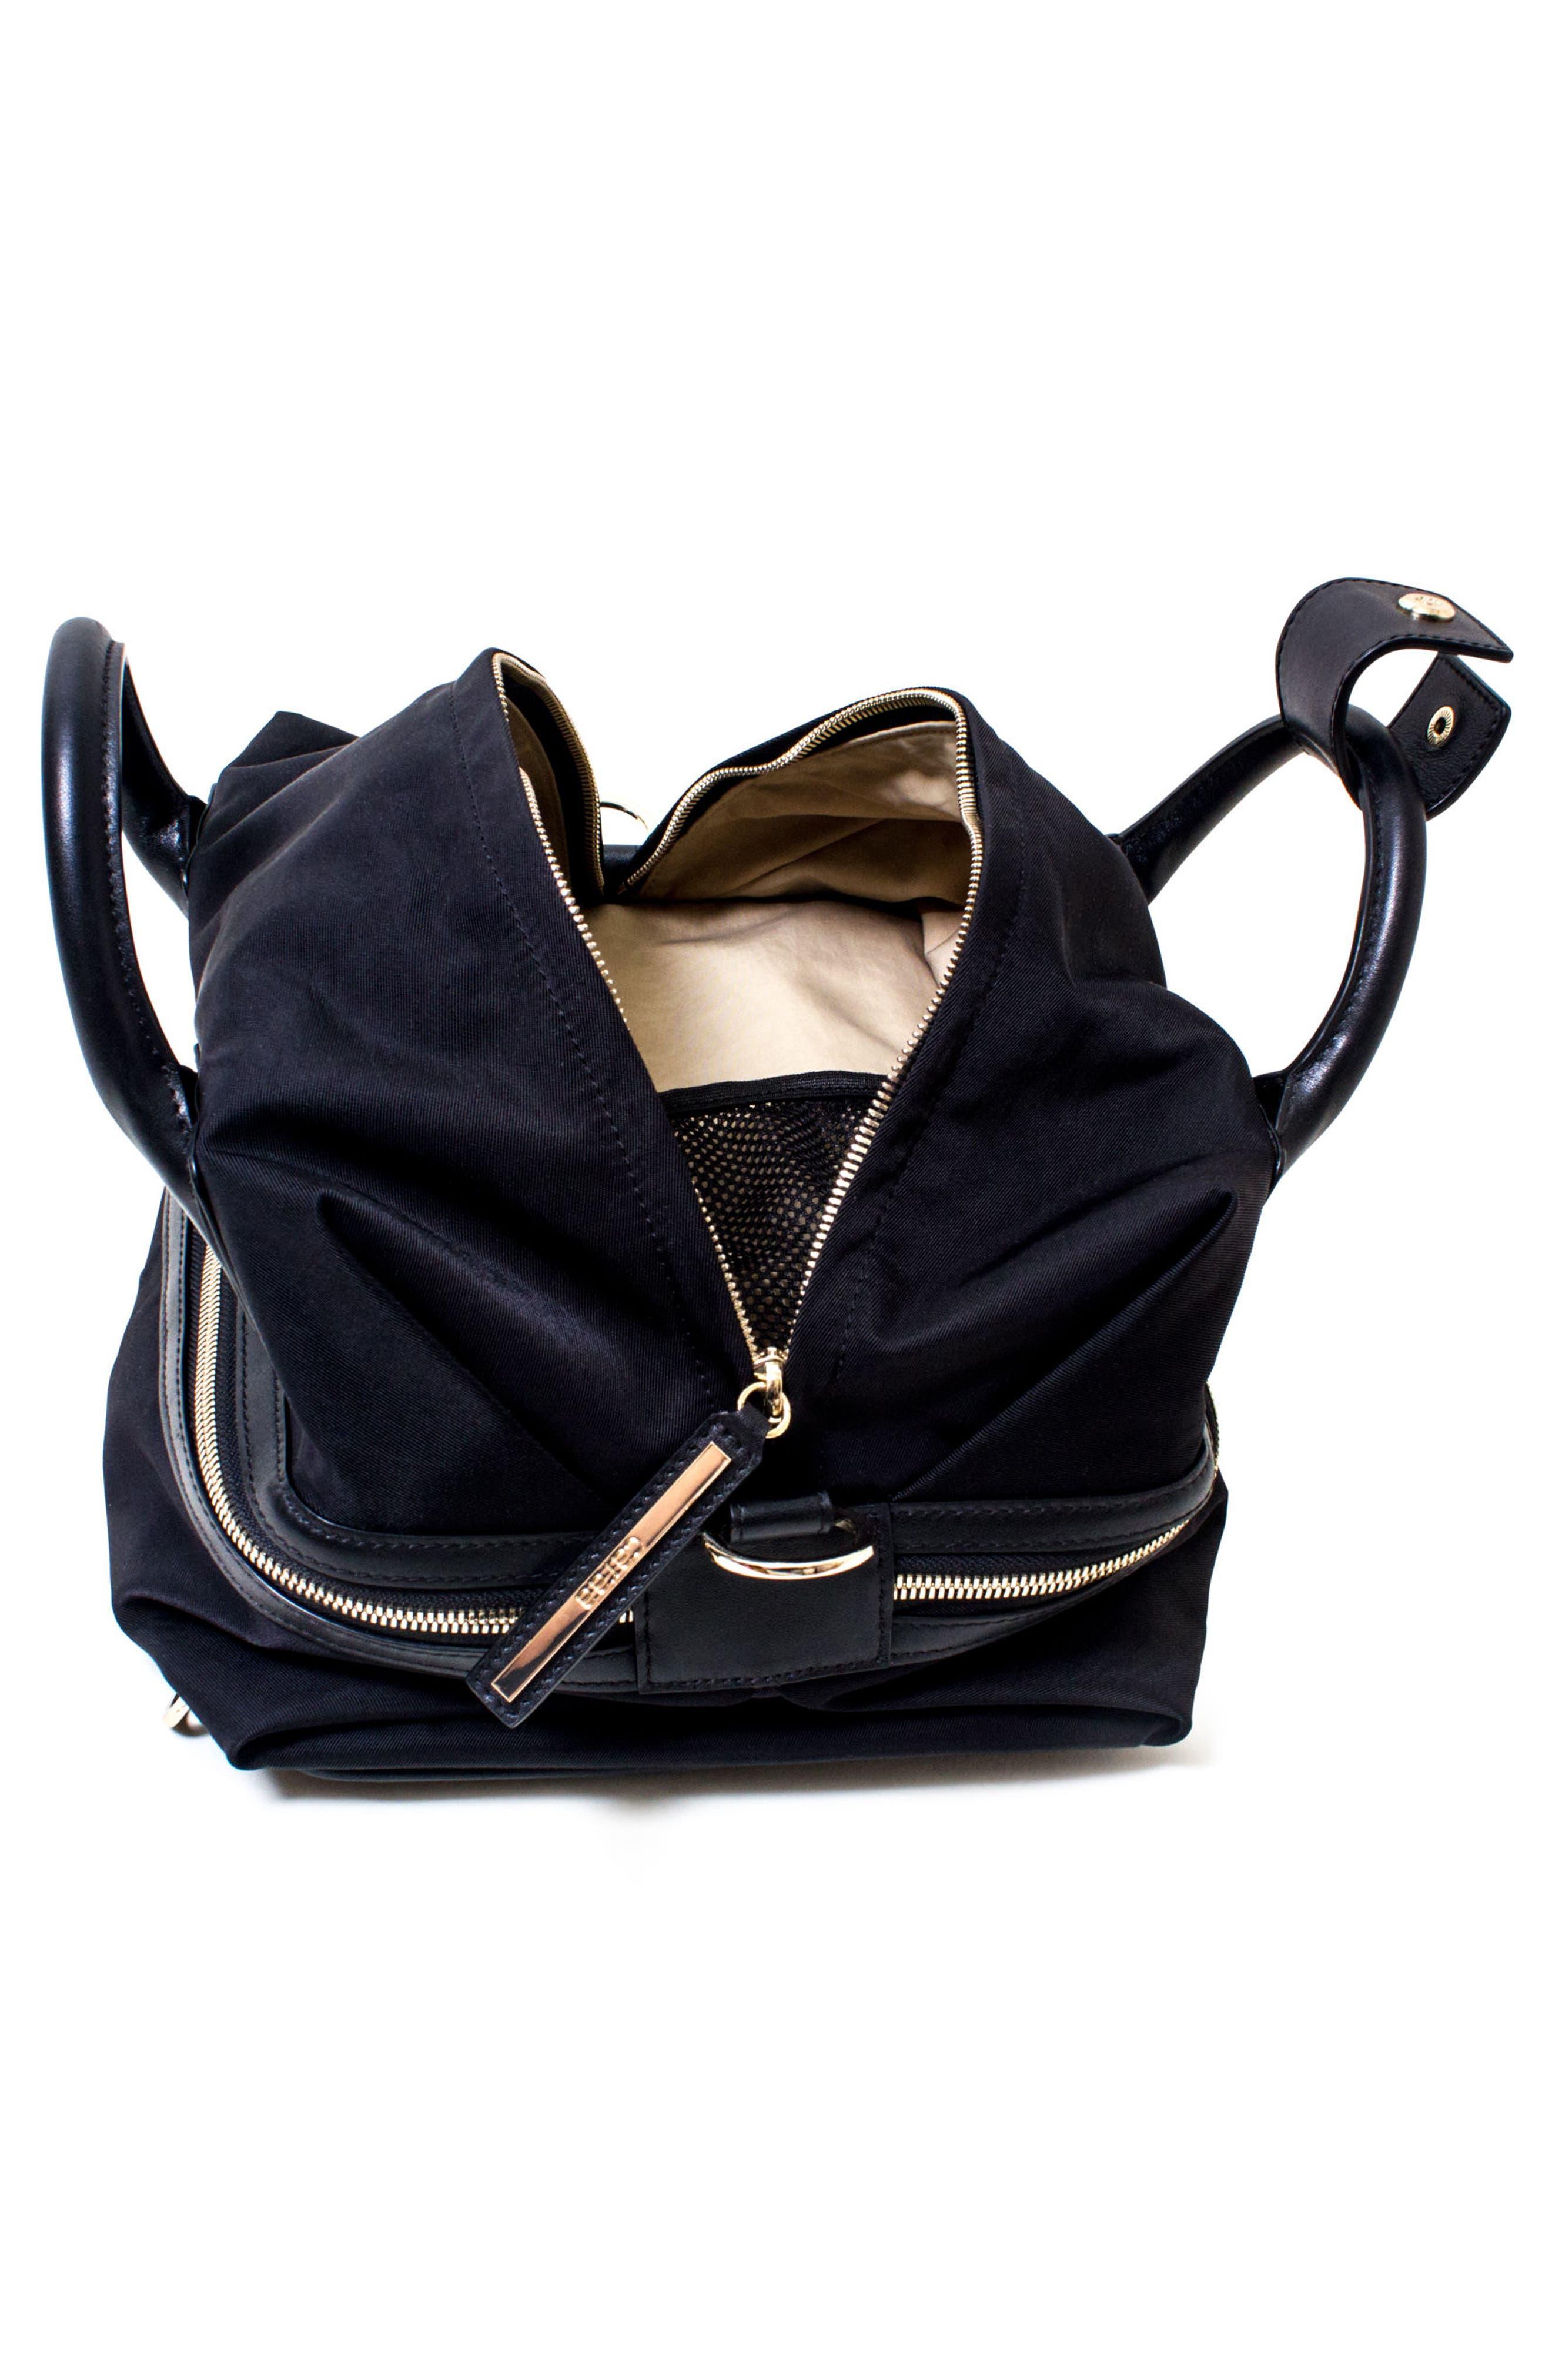 Studio Duffel Backpack,                             Alternate thumbnail 5, color,                             BLACK/ GOLD